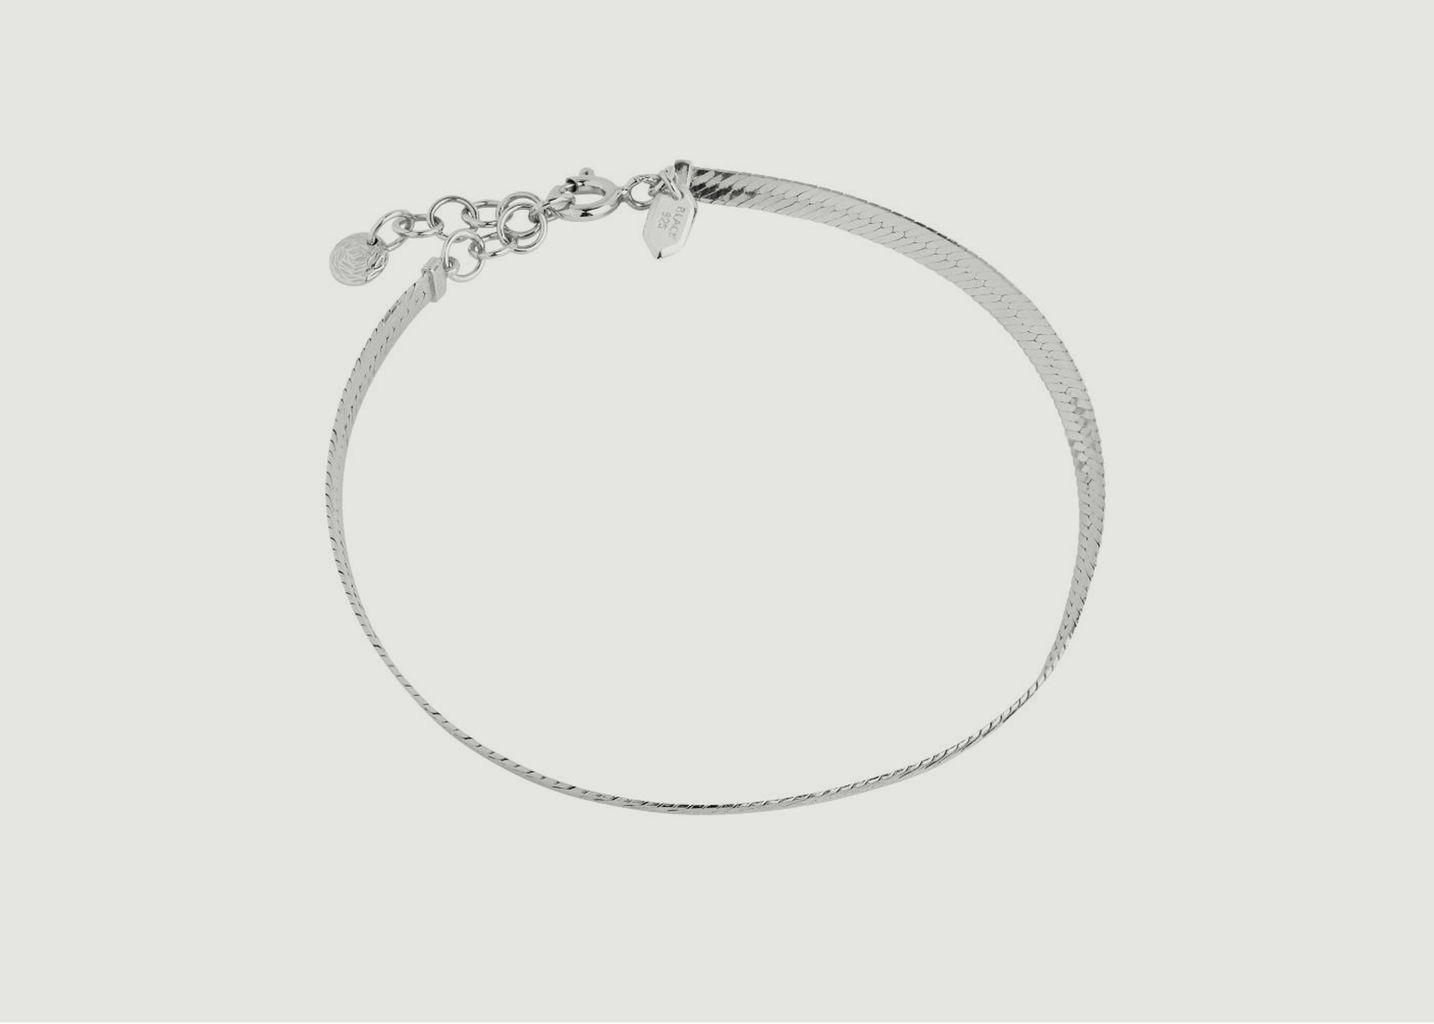 Bracelet Sentiero - Maria Black